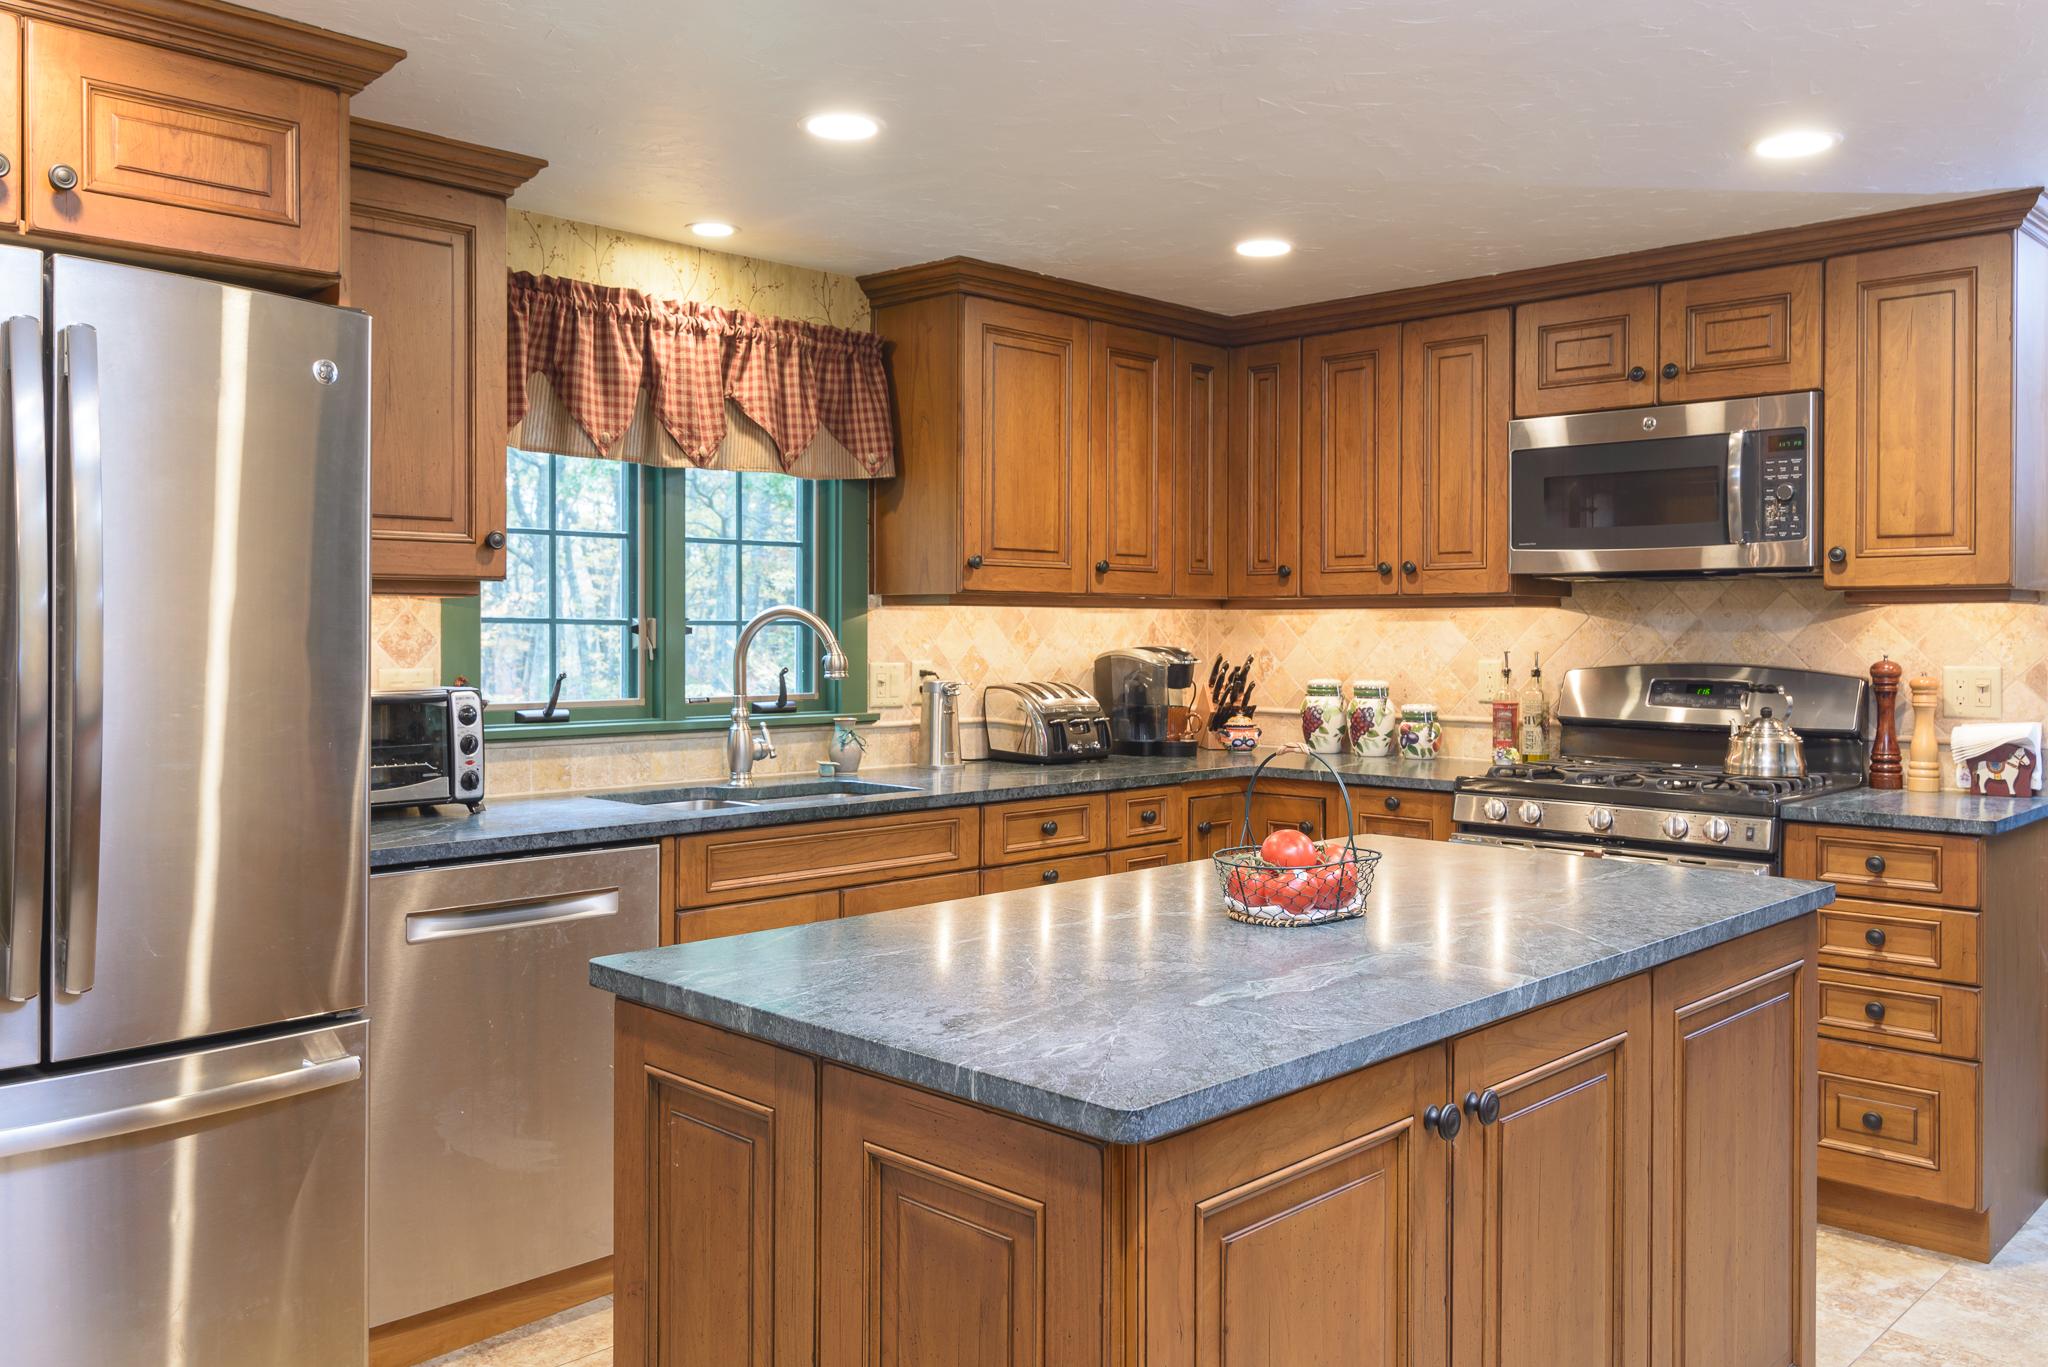 remodel a kitchen sink mounting hardware photos associates massachusetts remodeling boylston ma